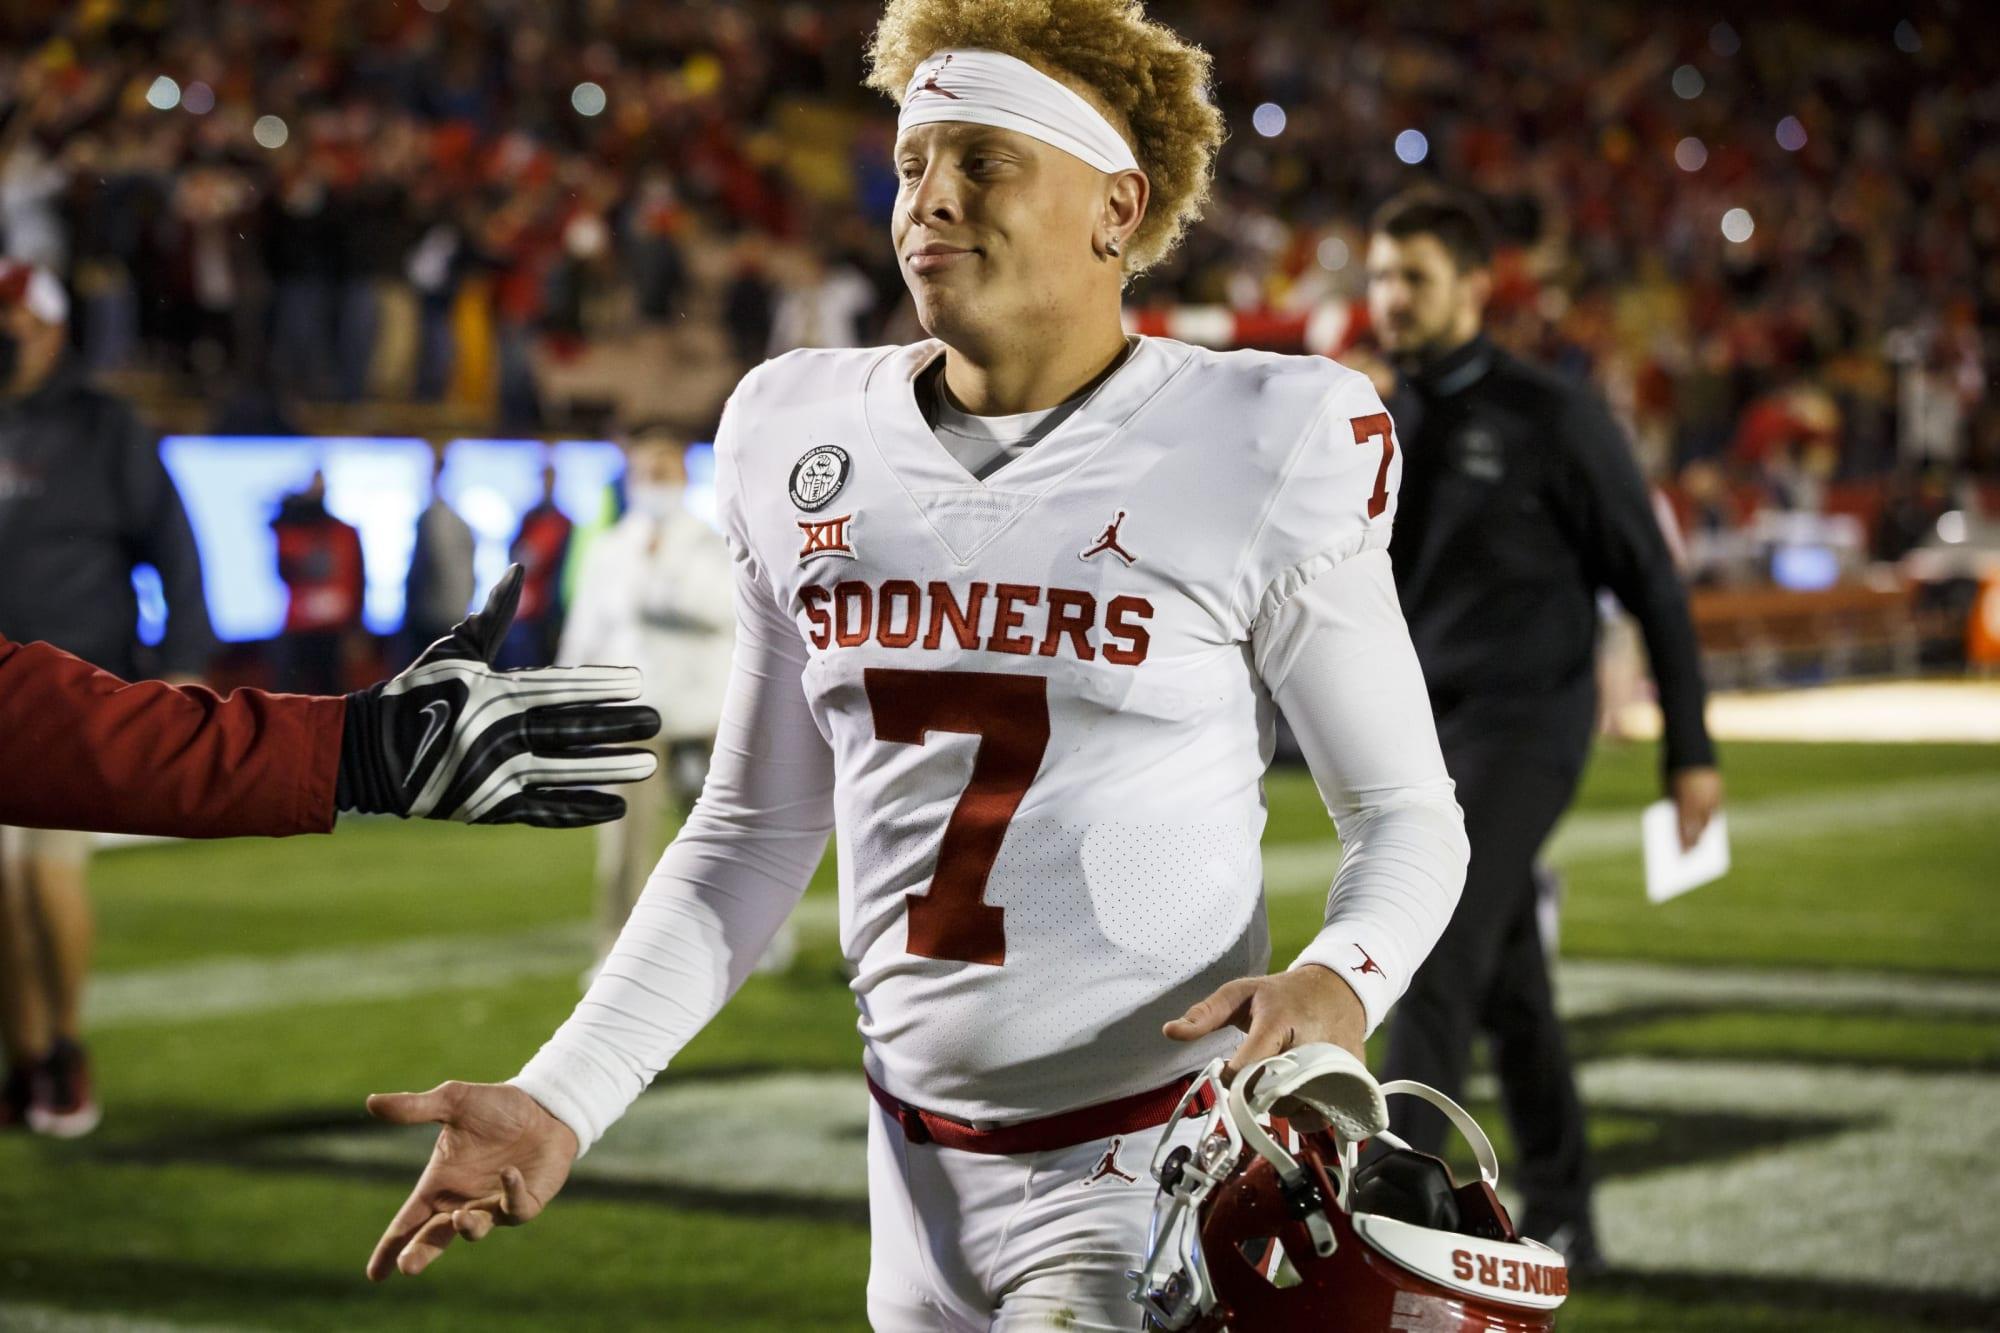 Oklahoma football: Sooners let another one get awayOklahoma Football